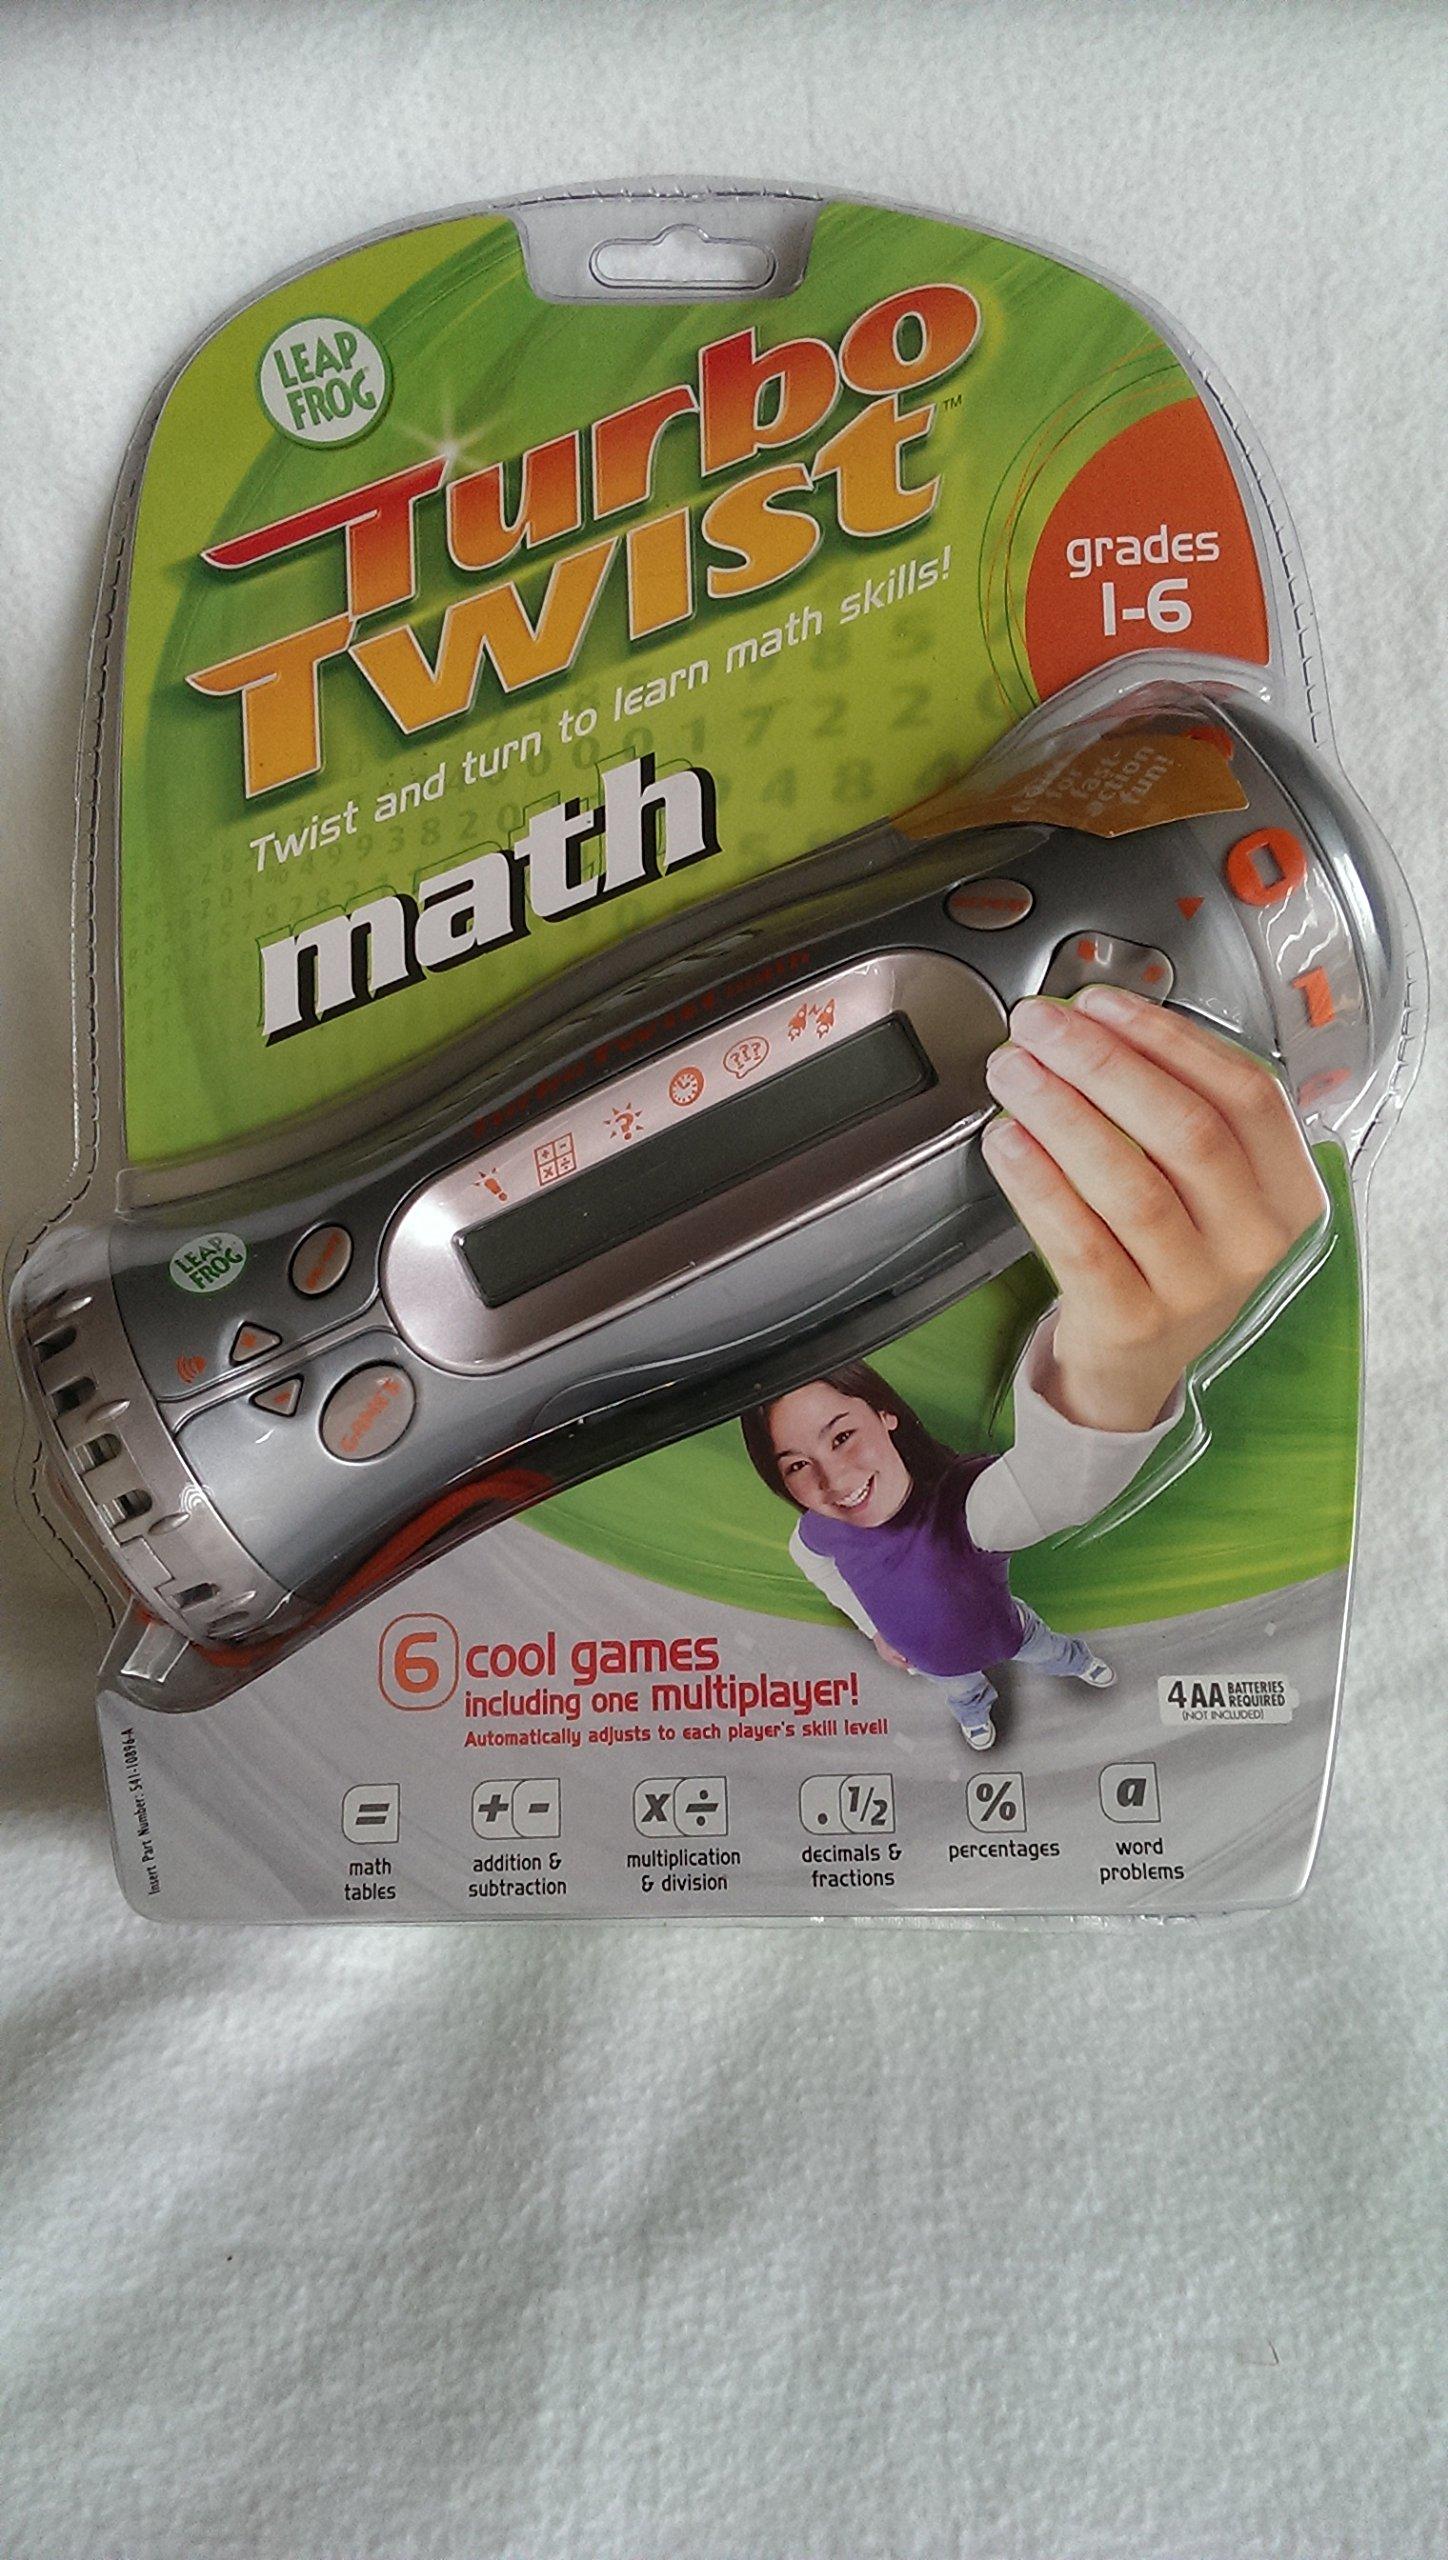 Turbo Twist Math Grades 1-6 by Leap Frog (Image #1)